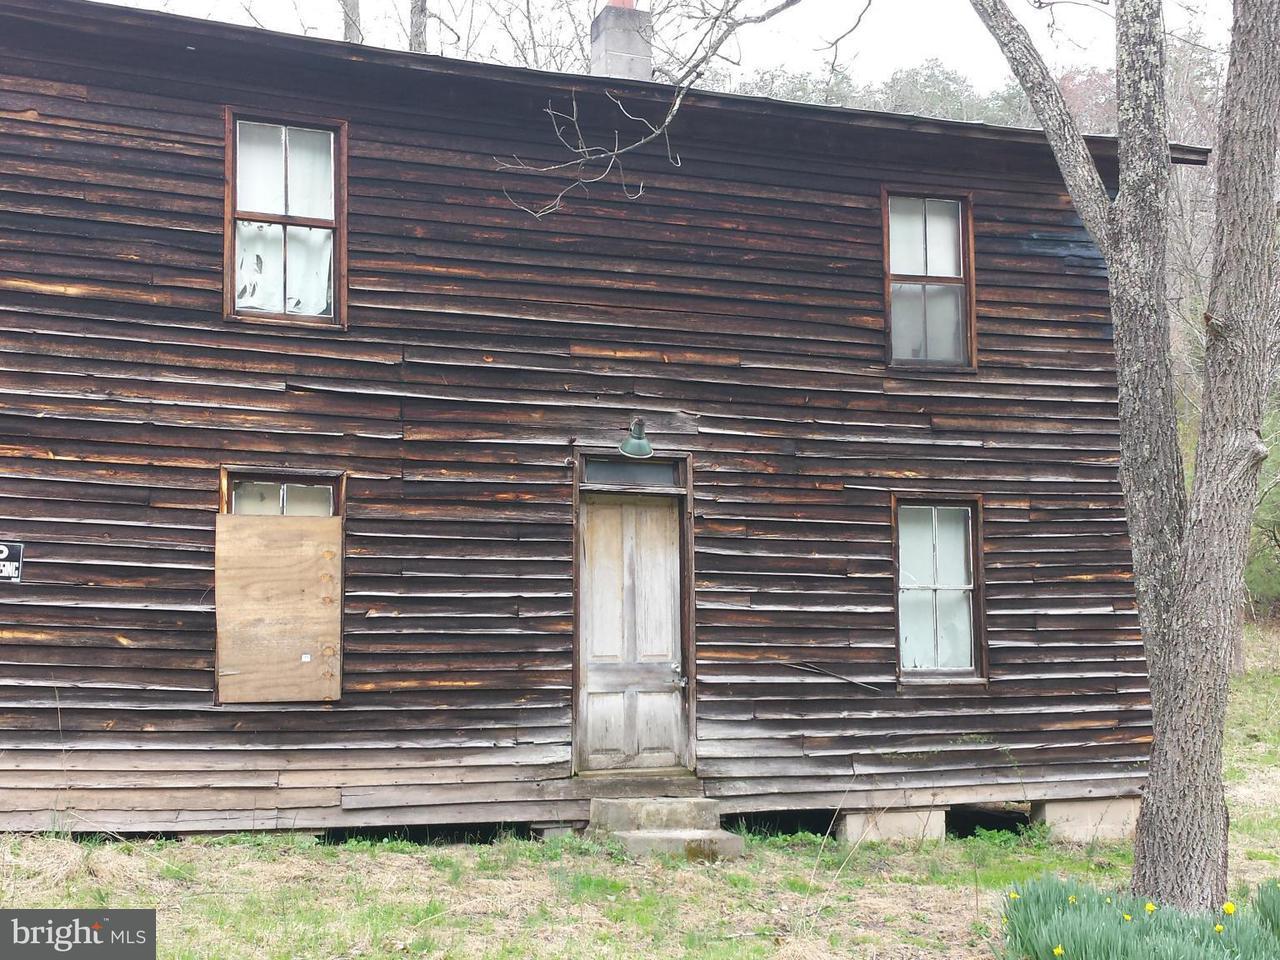 Additional photo for property listing at 918 Tussing Lane 918 Tussing Lane Mount Jackson, 弗吉尼亚州 22842 美国